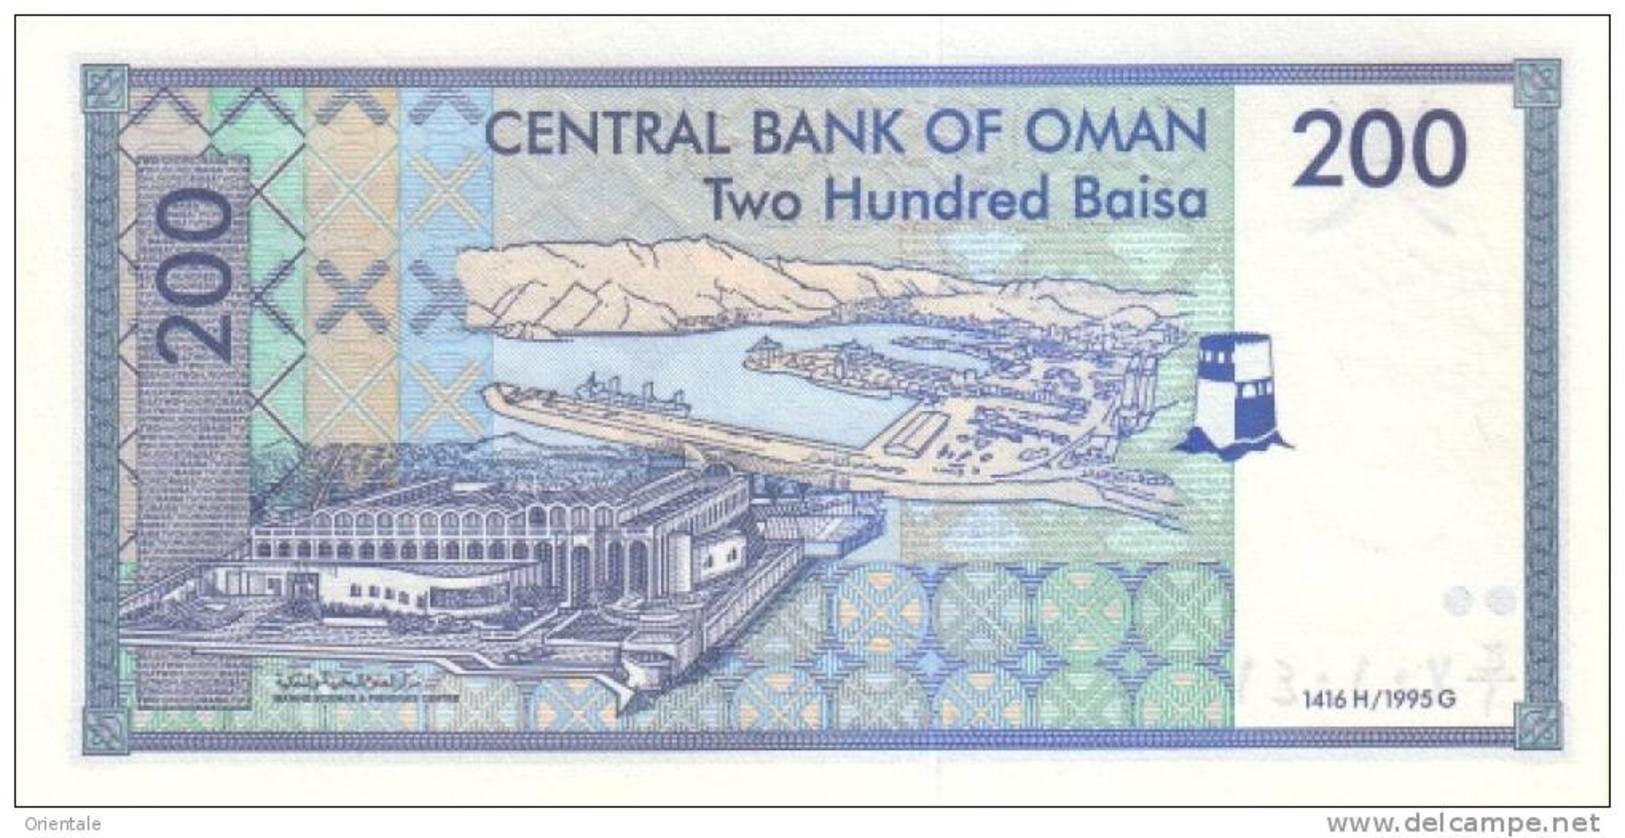 OMAN P. 32 200 B 1995 UNC - Oman